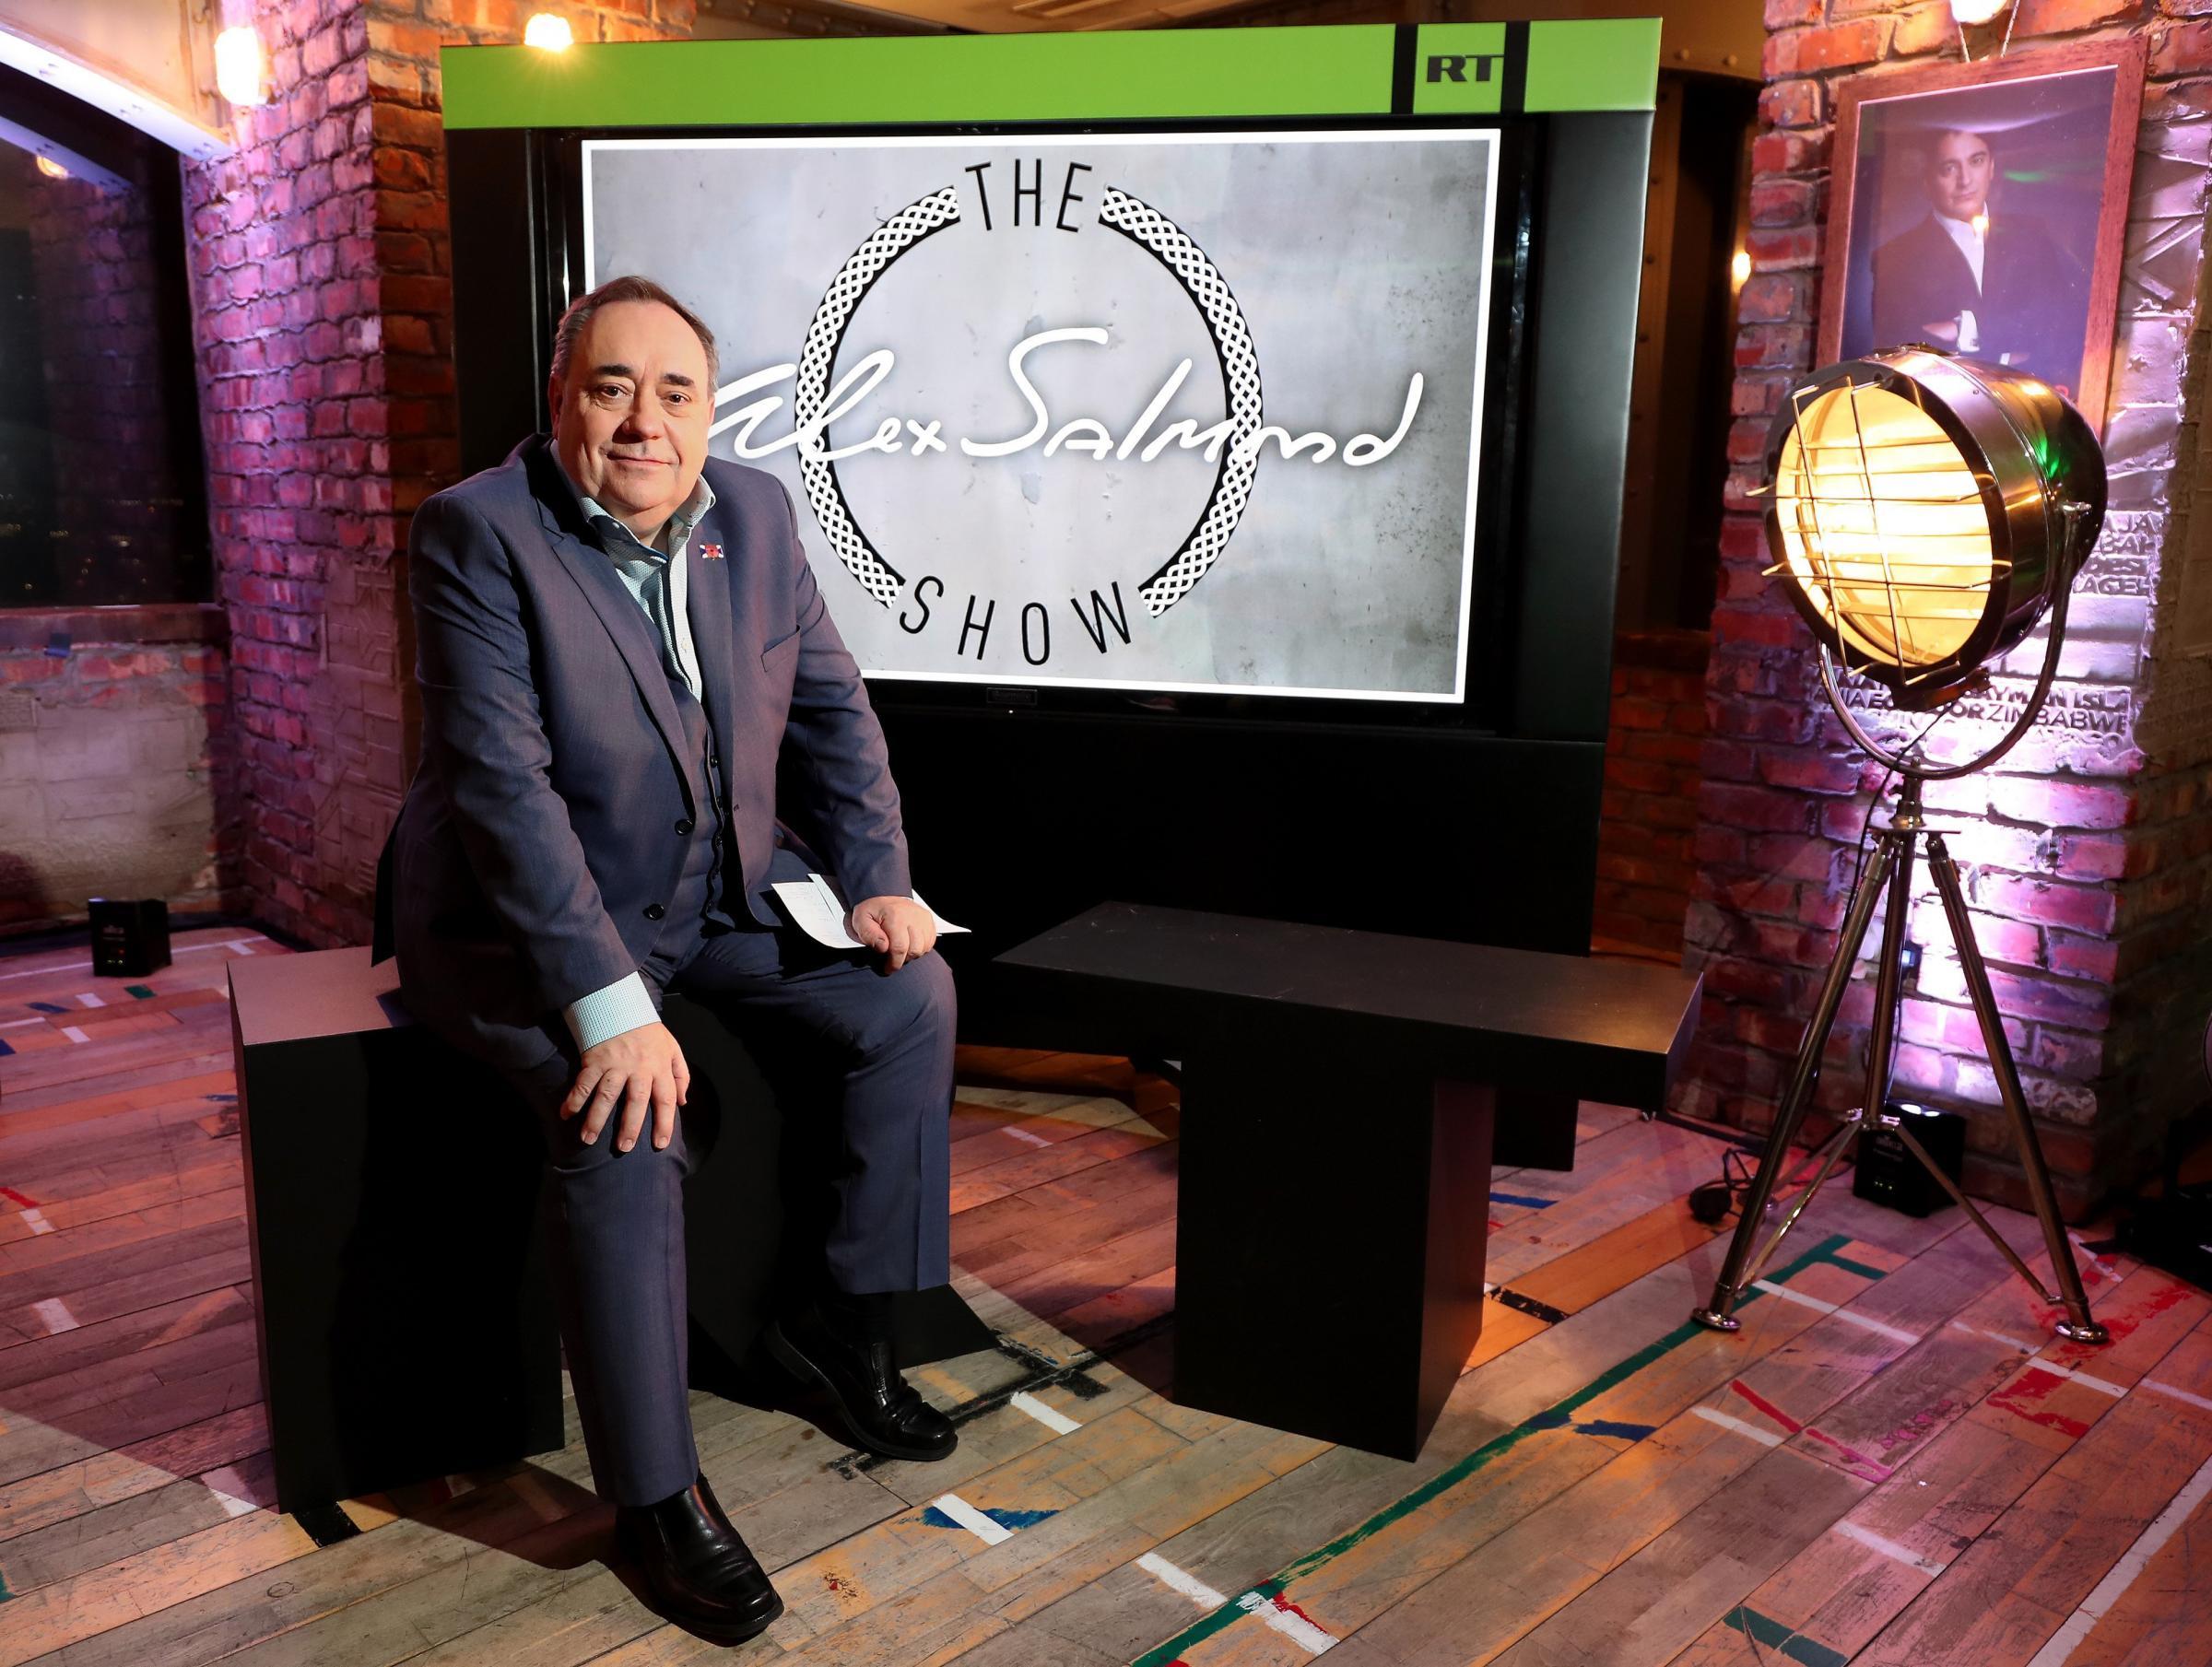 The Alex Salmond Show